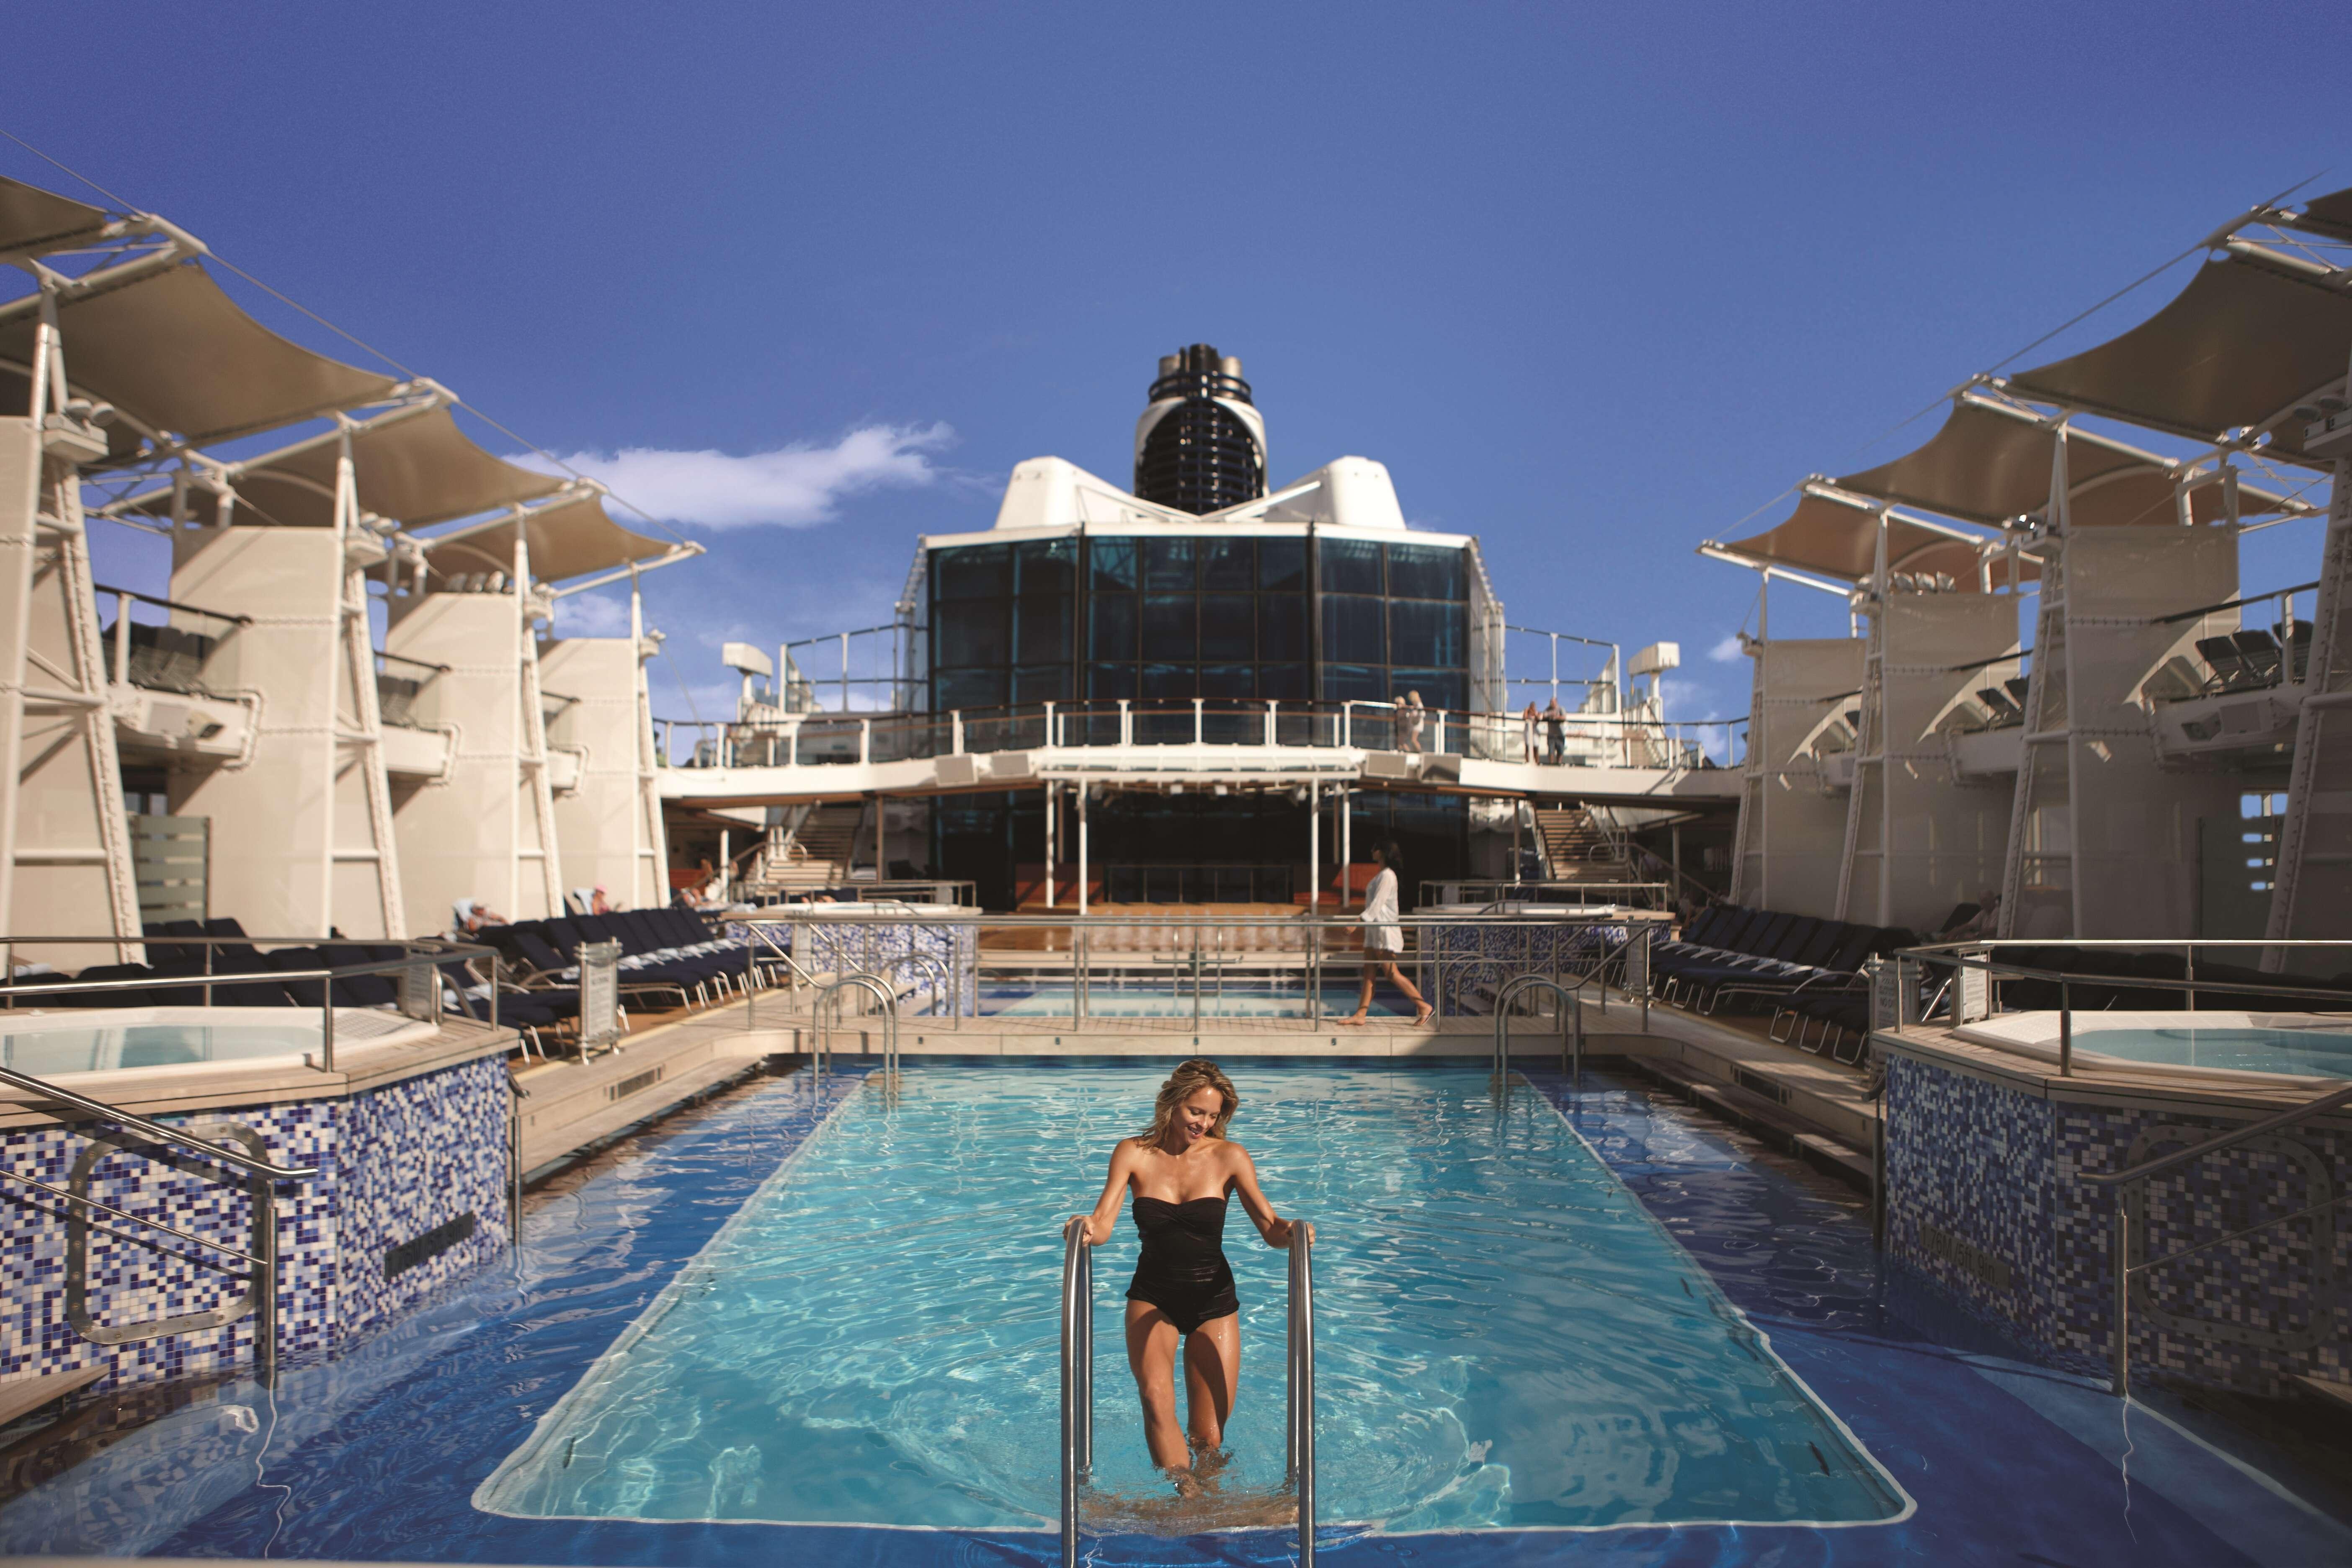 12 Night Celebrity Equinox Ultimate Southern Caribbean Cruise - Feb 28, 2021